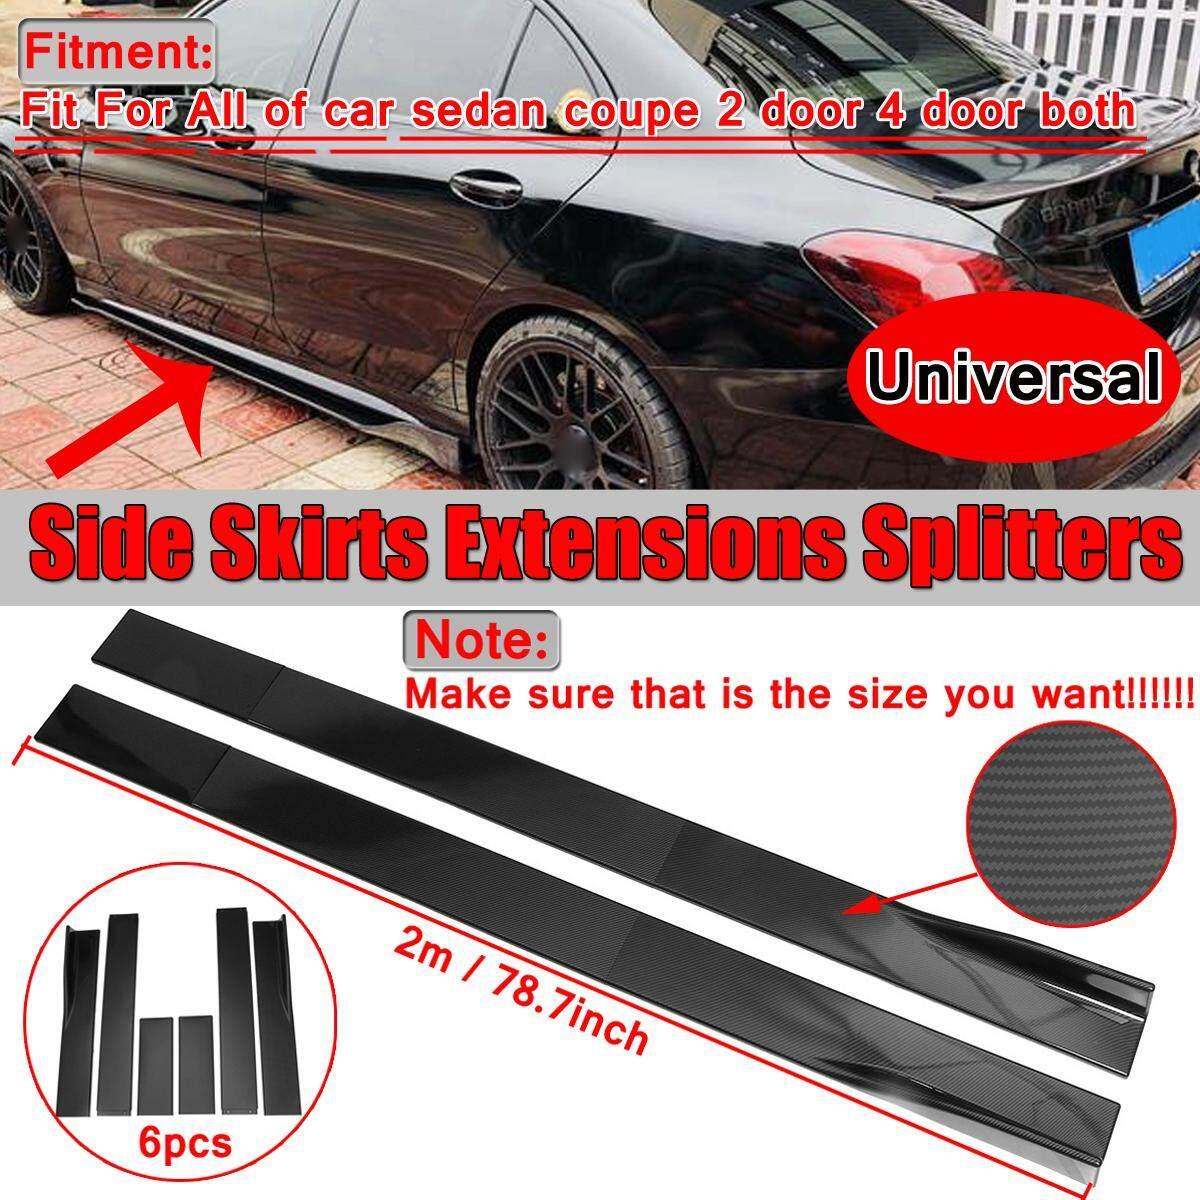 Carbon Fiber Look Universal Car Side Skirt Extension Blades Rocker Splitter